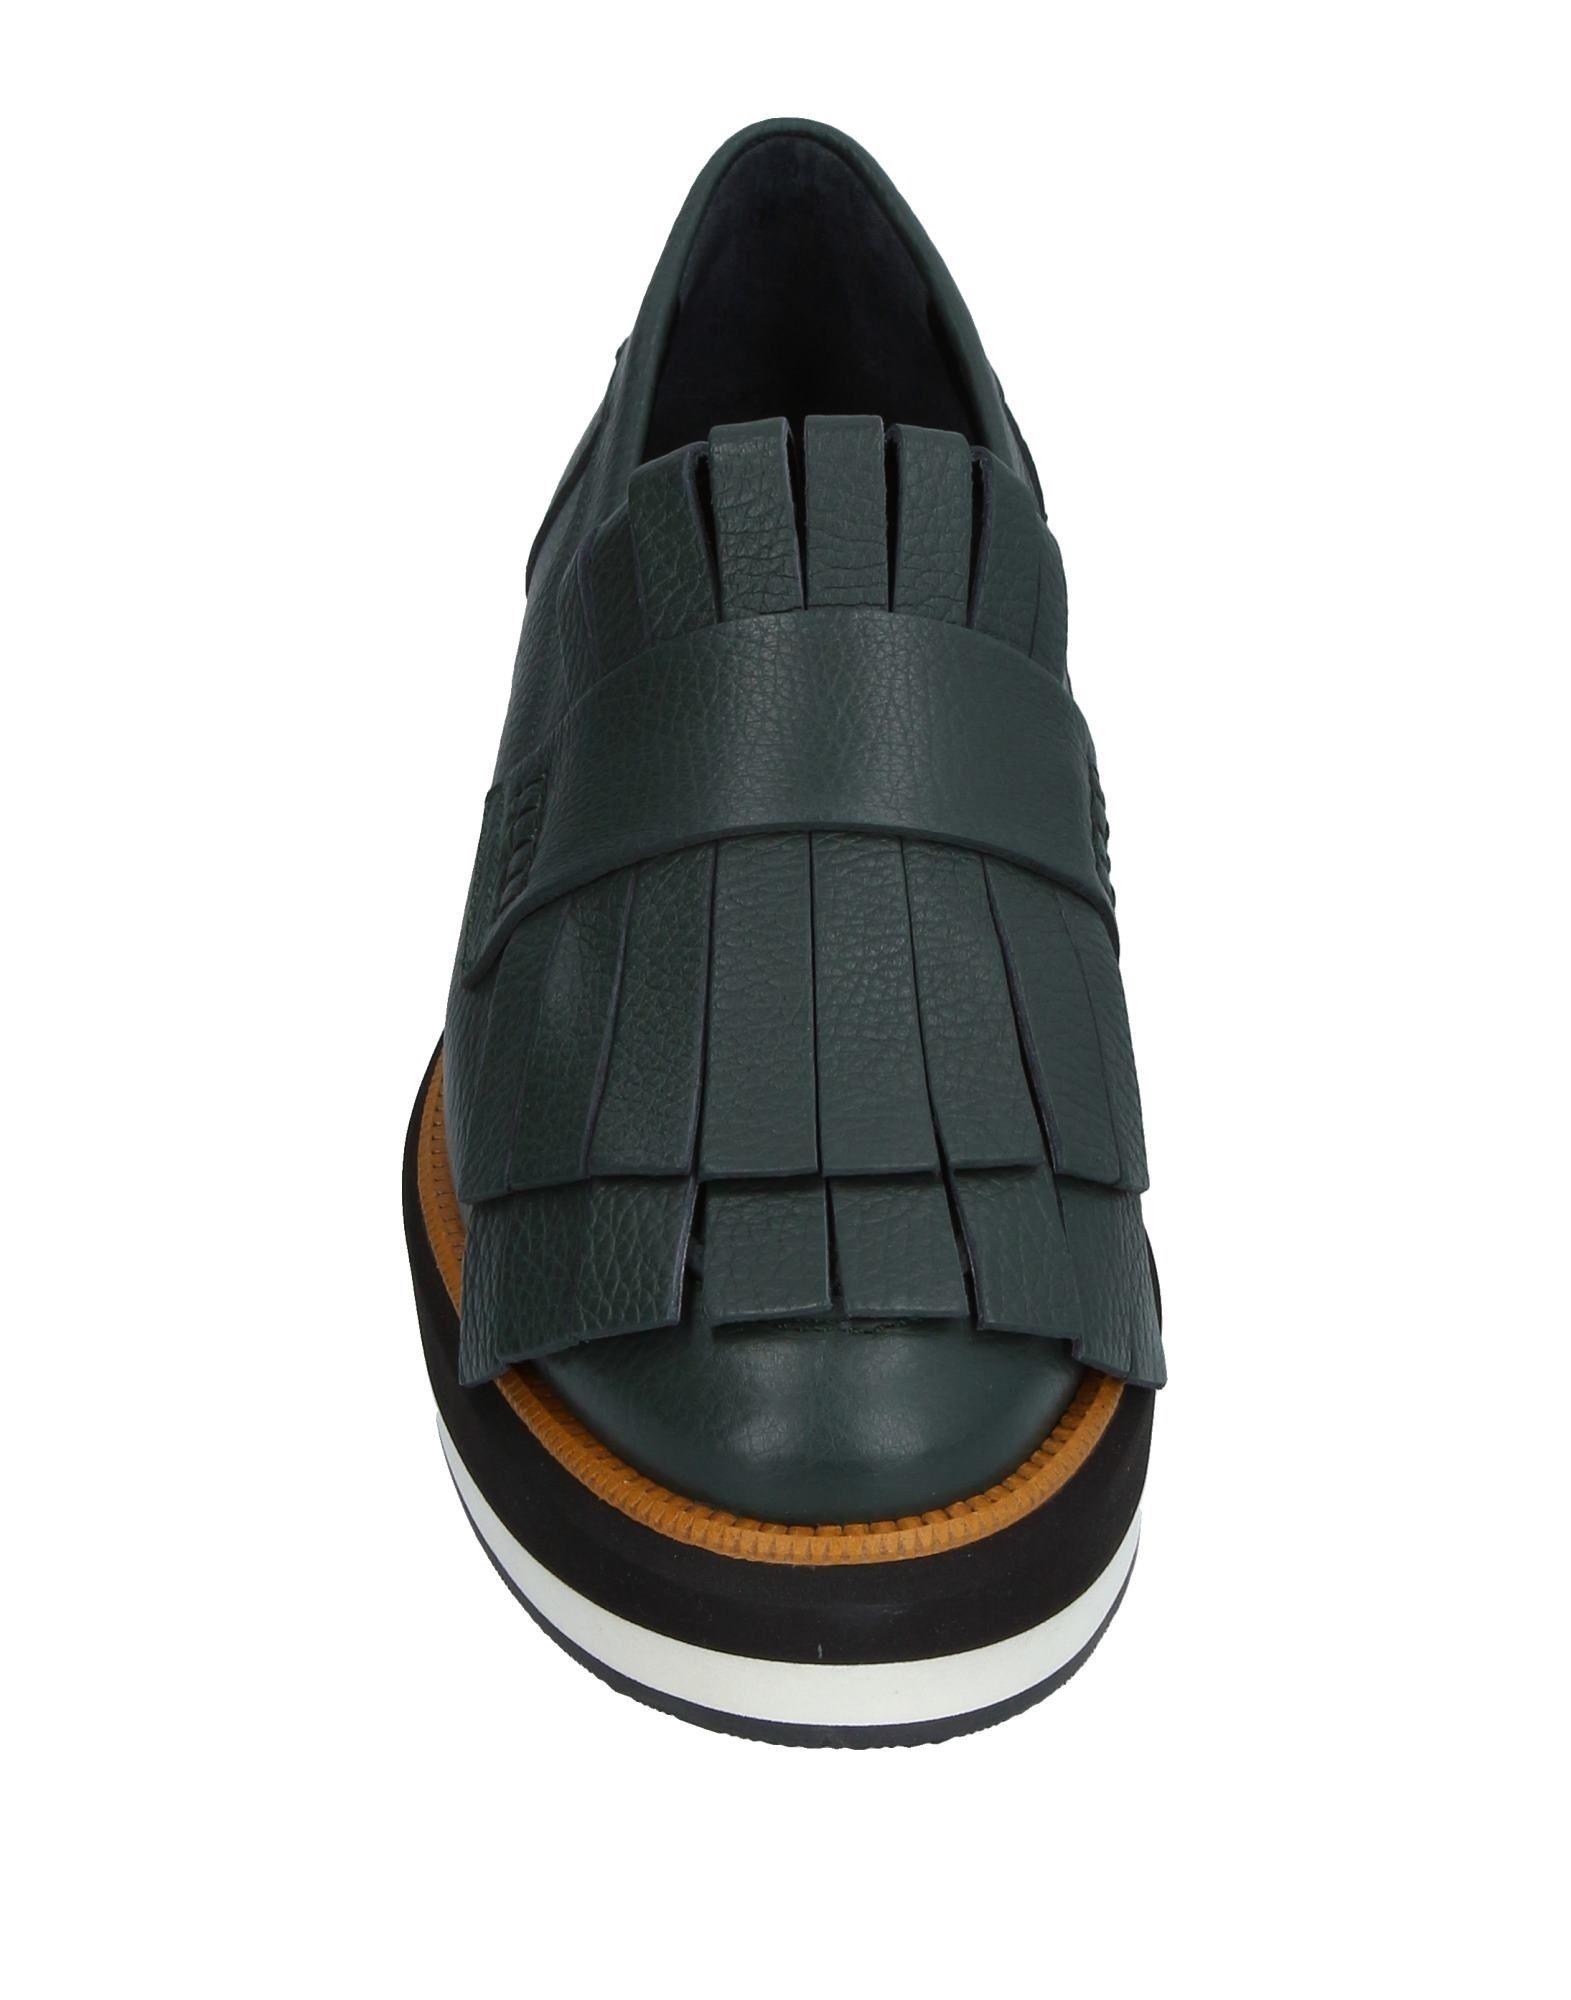 Stilvolle billige Schuhe Paloma  Barceló Mokassins Damen  Paloma 11224186MN 4f6d23